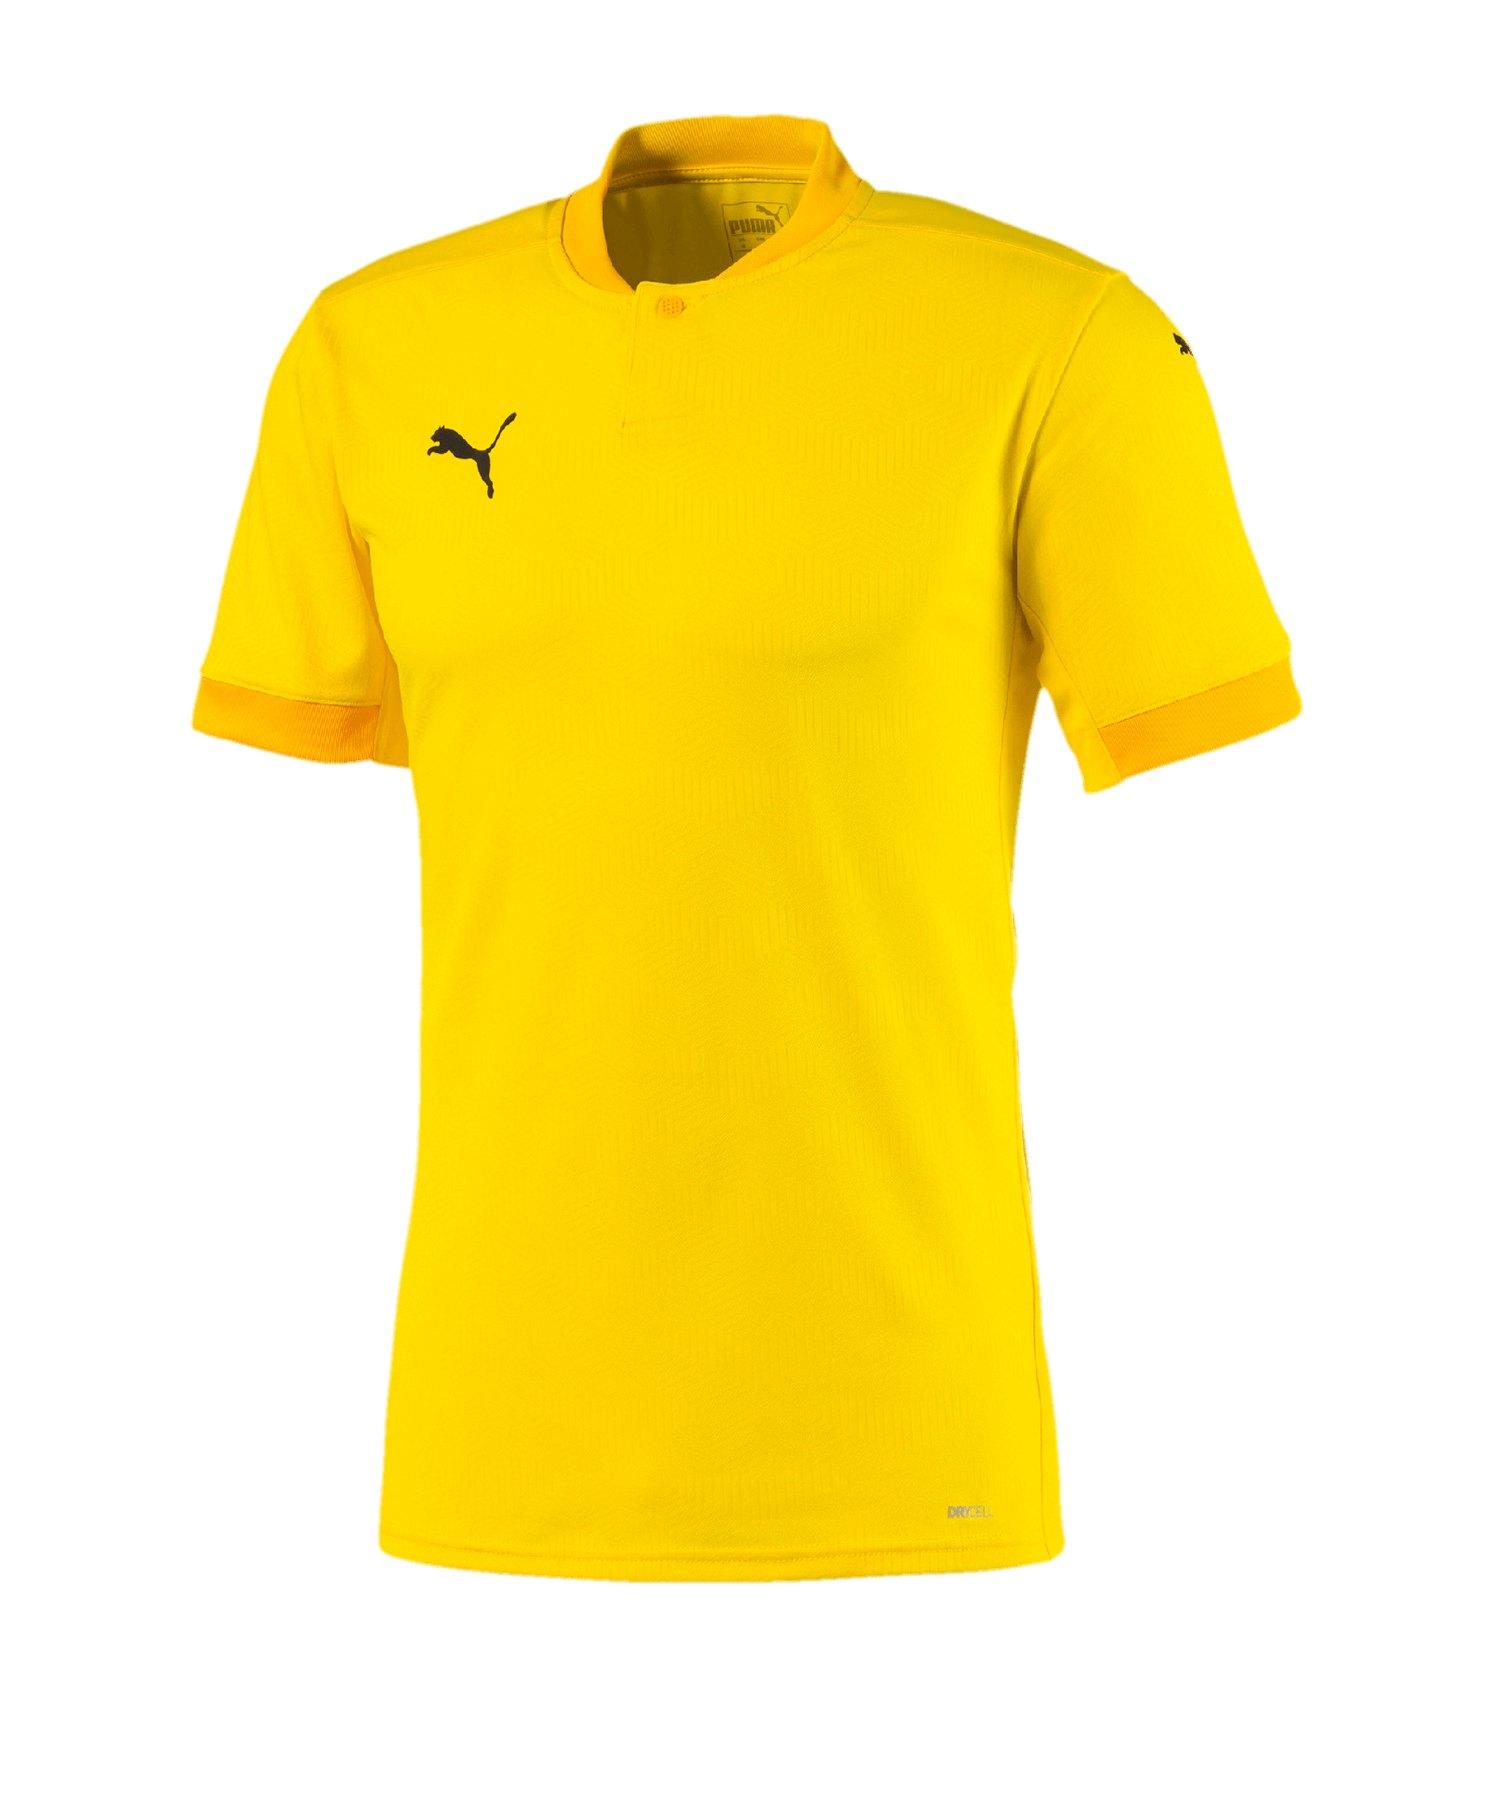 PUMA teamFINAL 21 Trikot kurzarm Gelb F07 - gelb